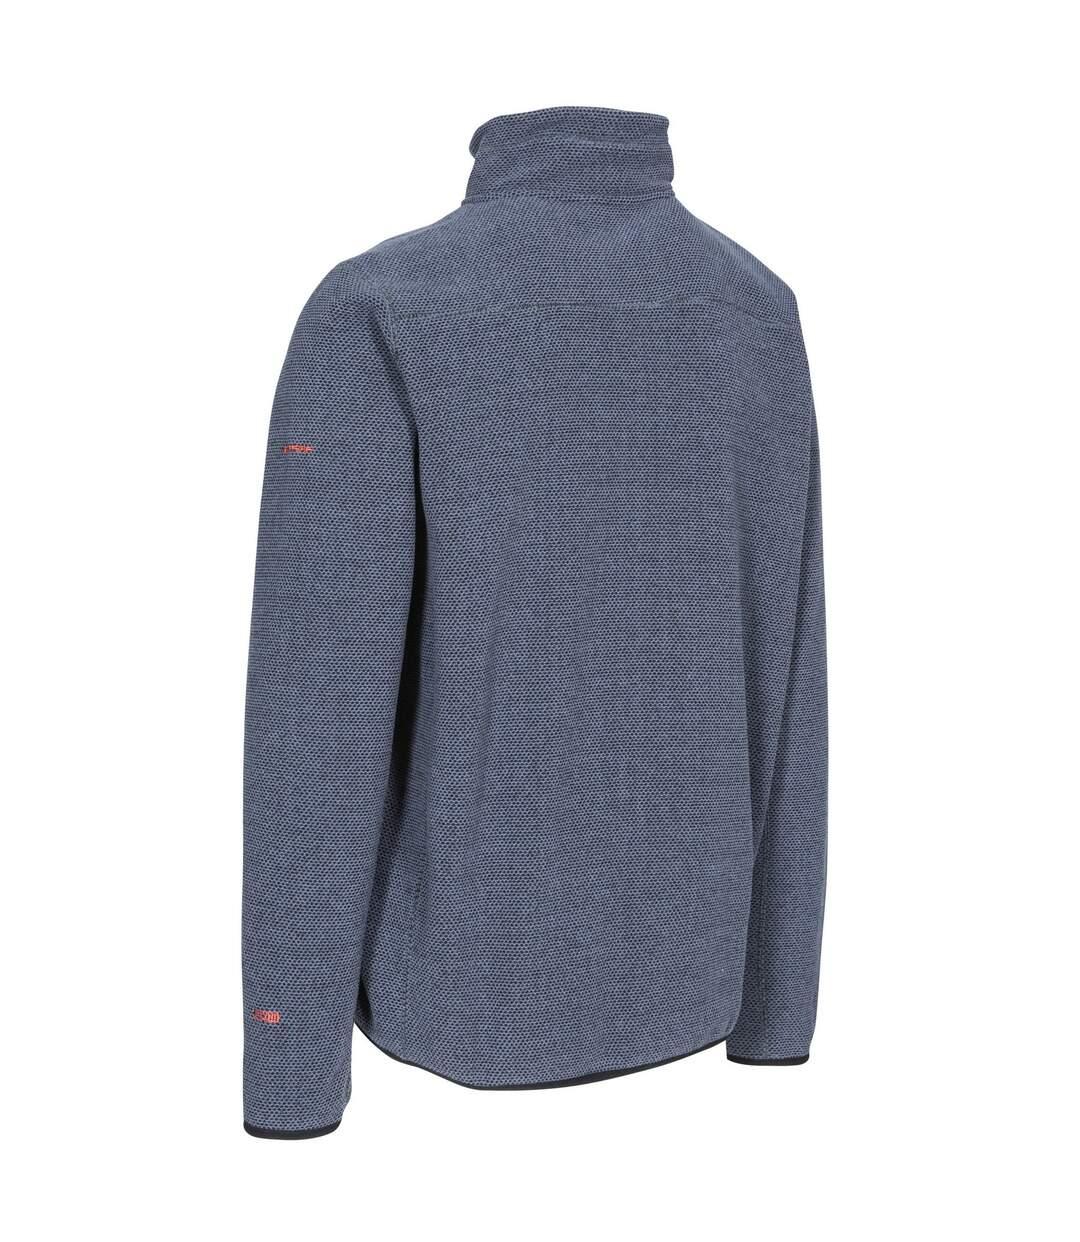 Trespass Mens Limber Fleece (Black Marl) - UTTP4060